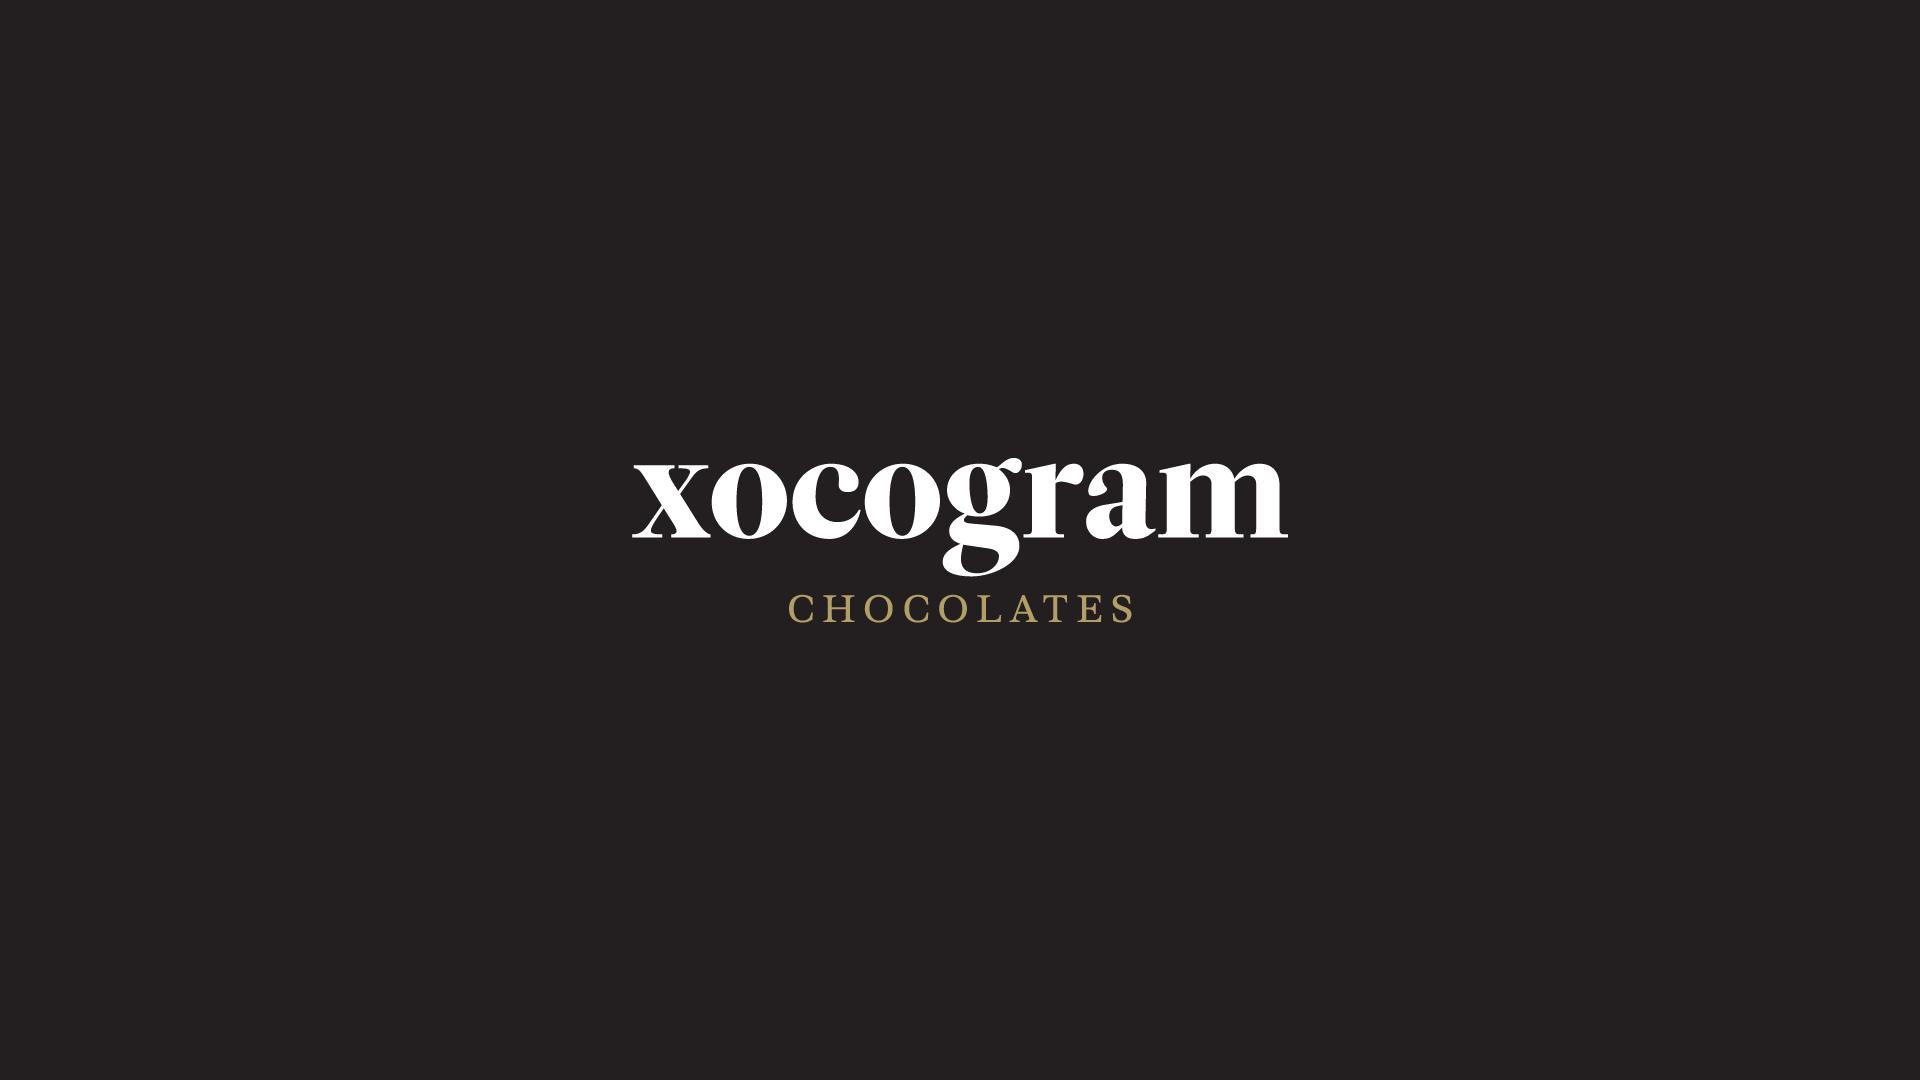 xocogram-daniel-niebla-01.png